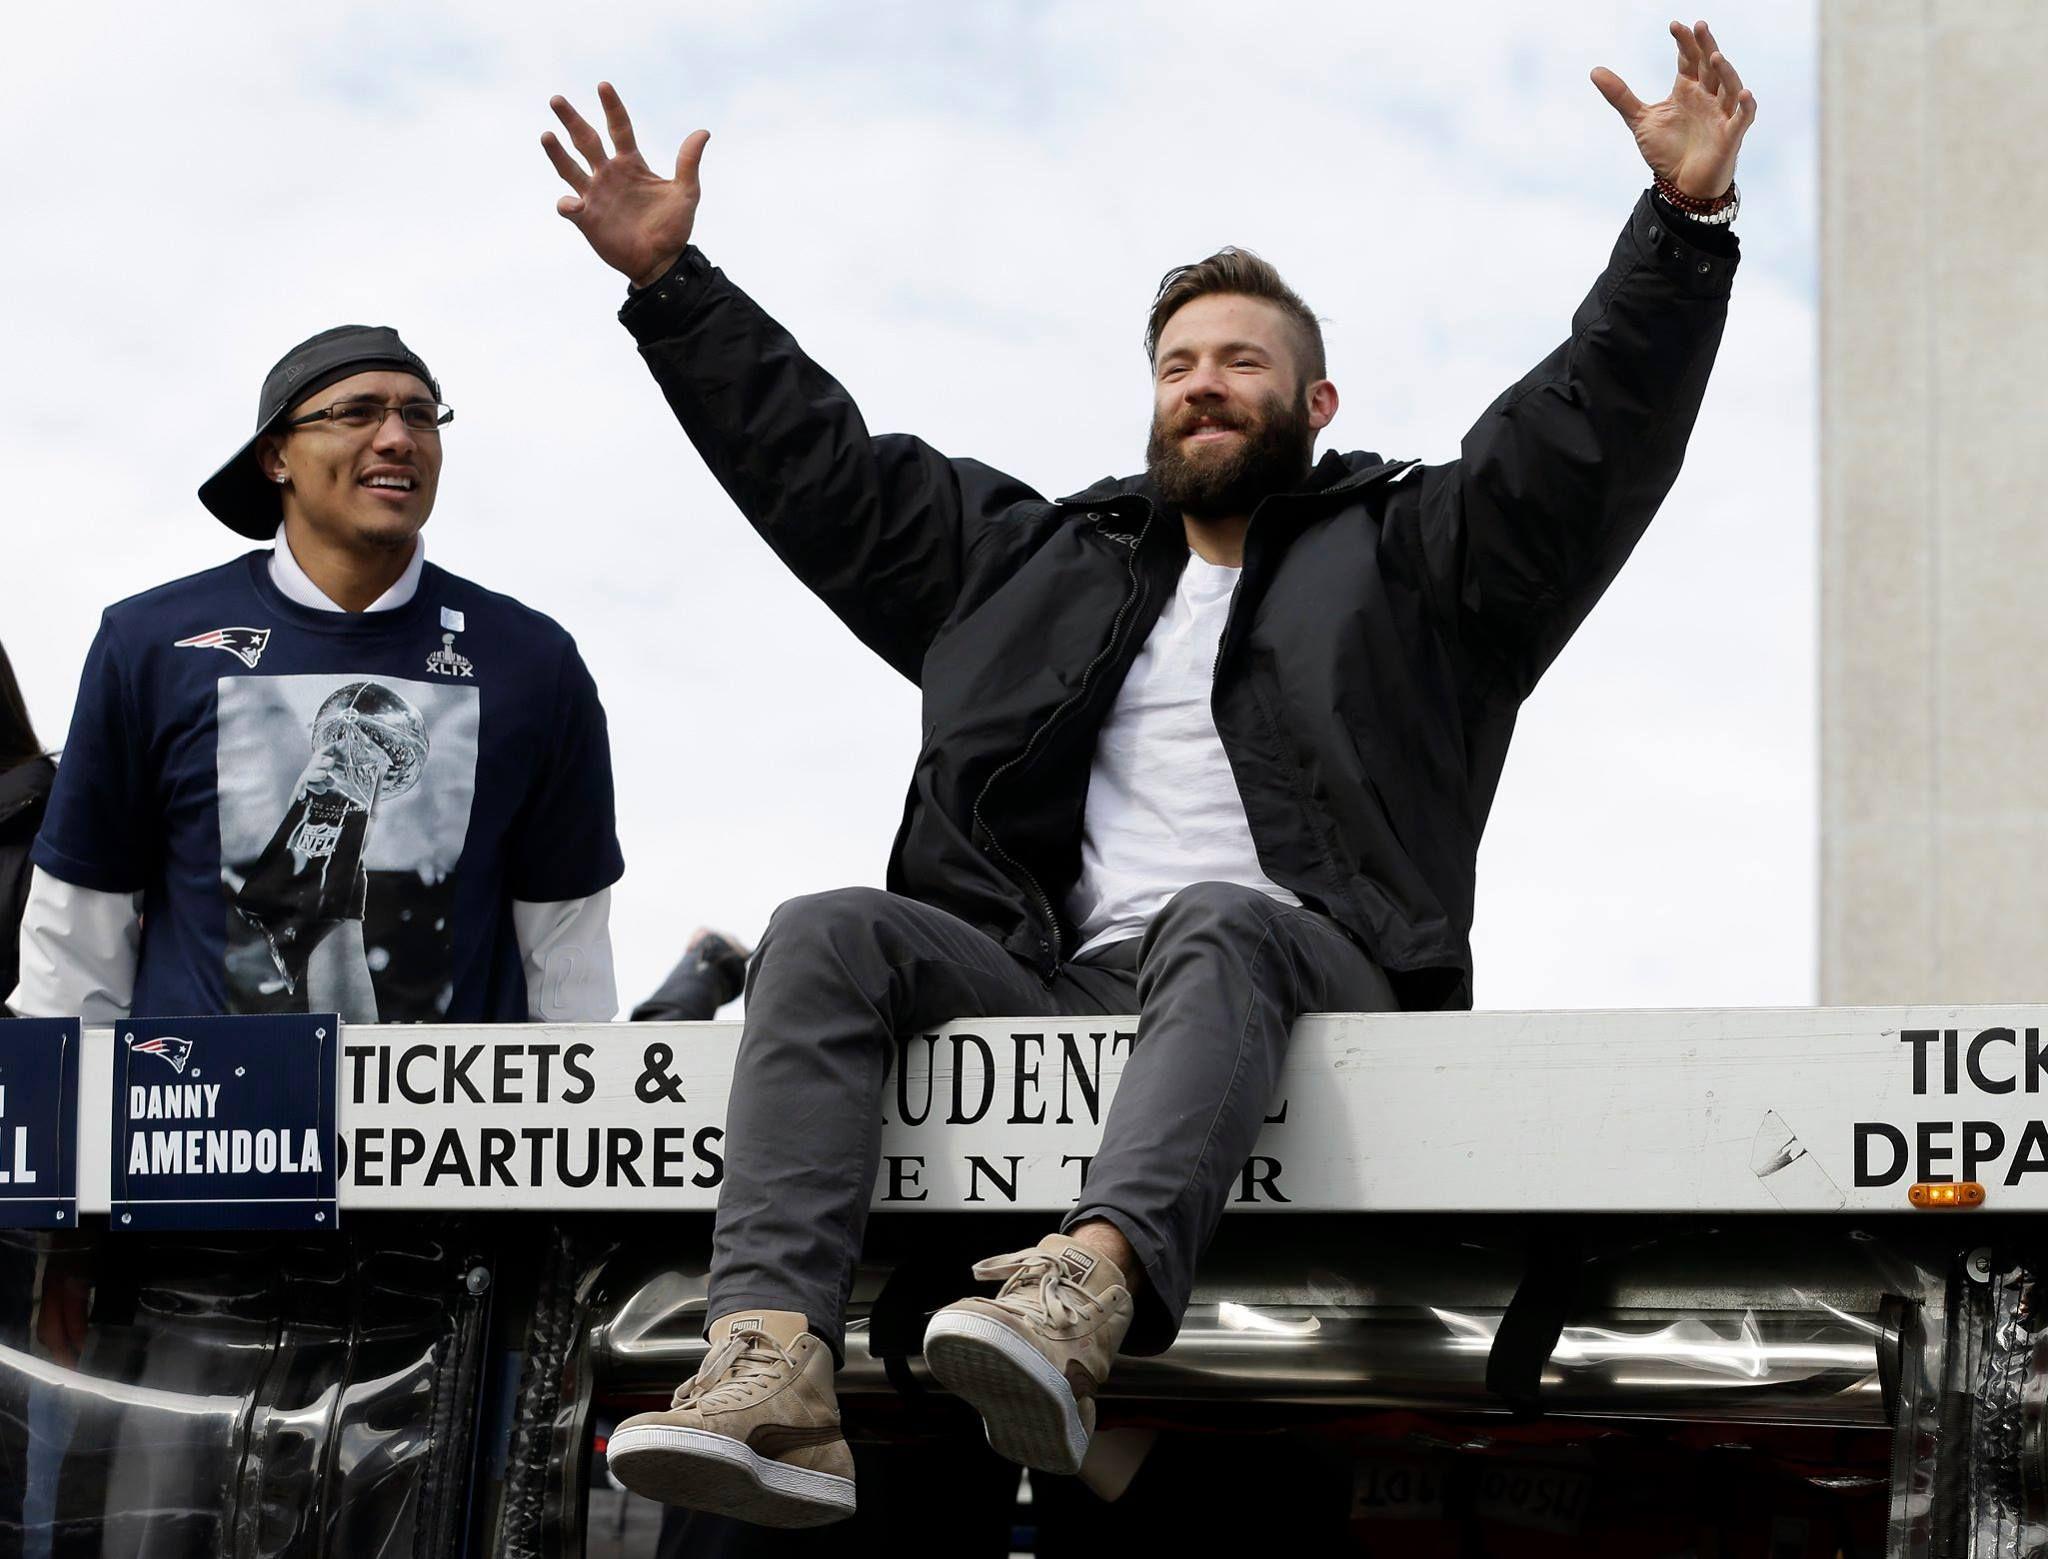 Julian Edelman Duck Boat Parade Xlix Julian Edelman New England Patriots New England Patriots Football